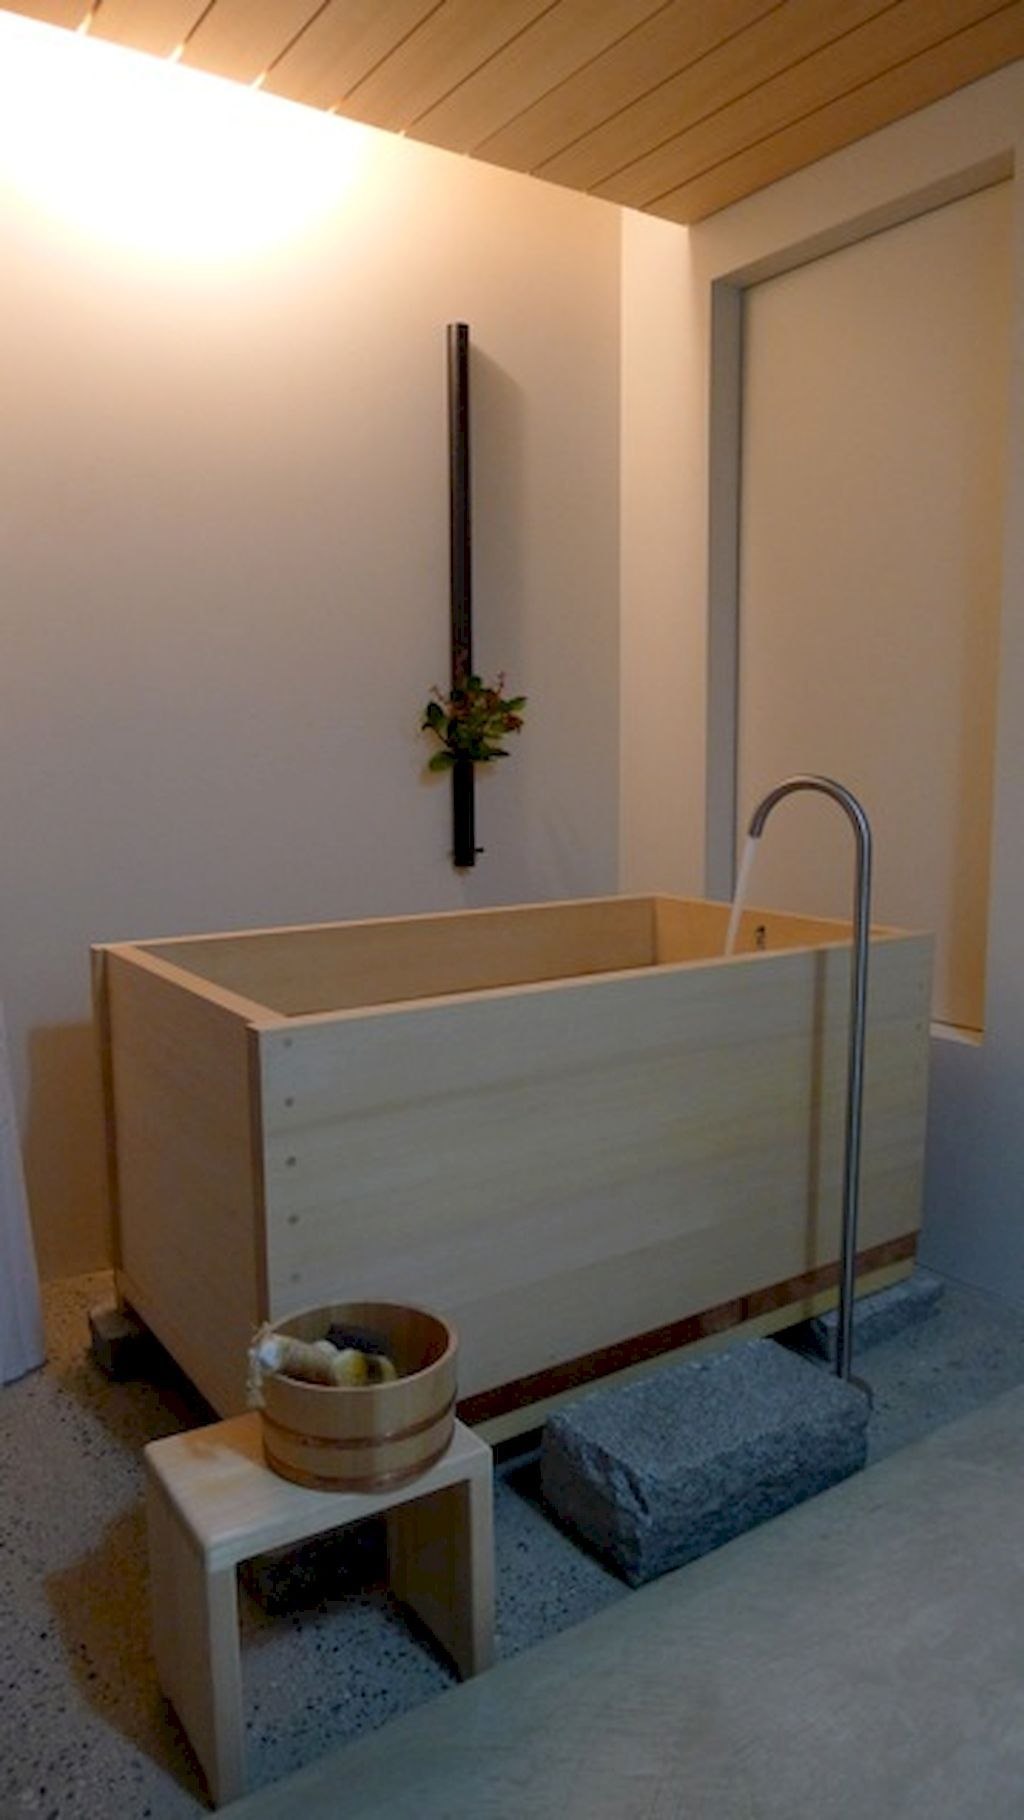 65 master bathroom bathtub remodel ideas with images